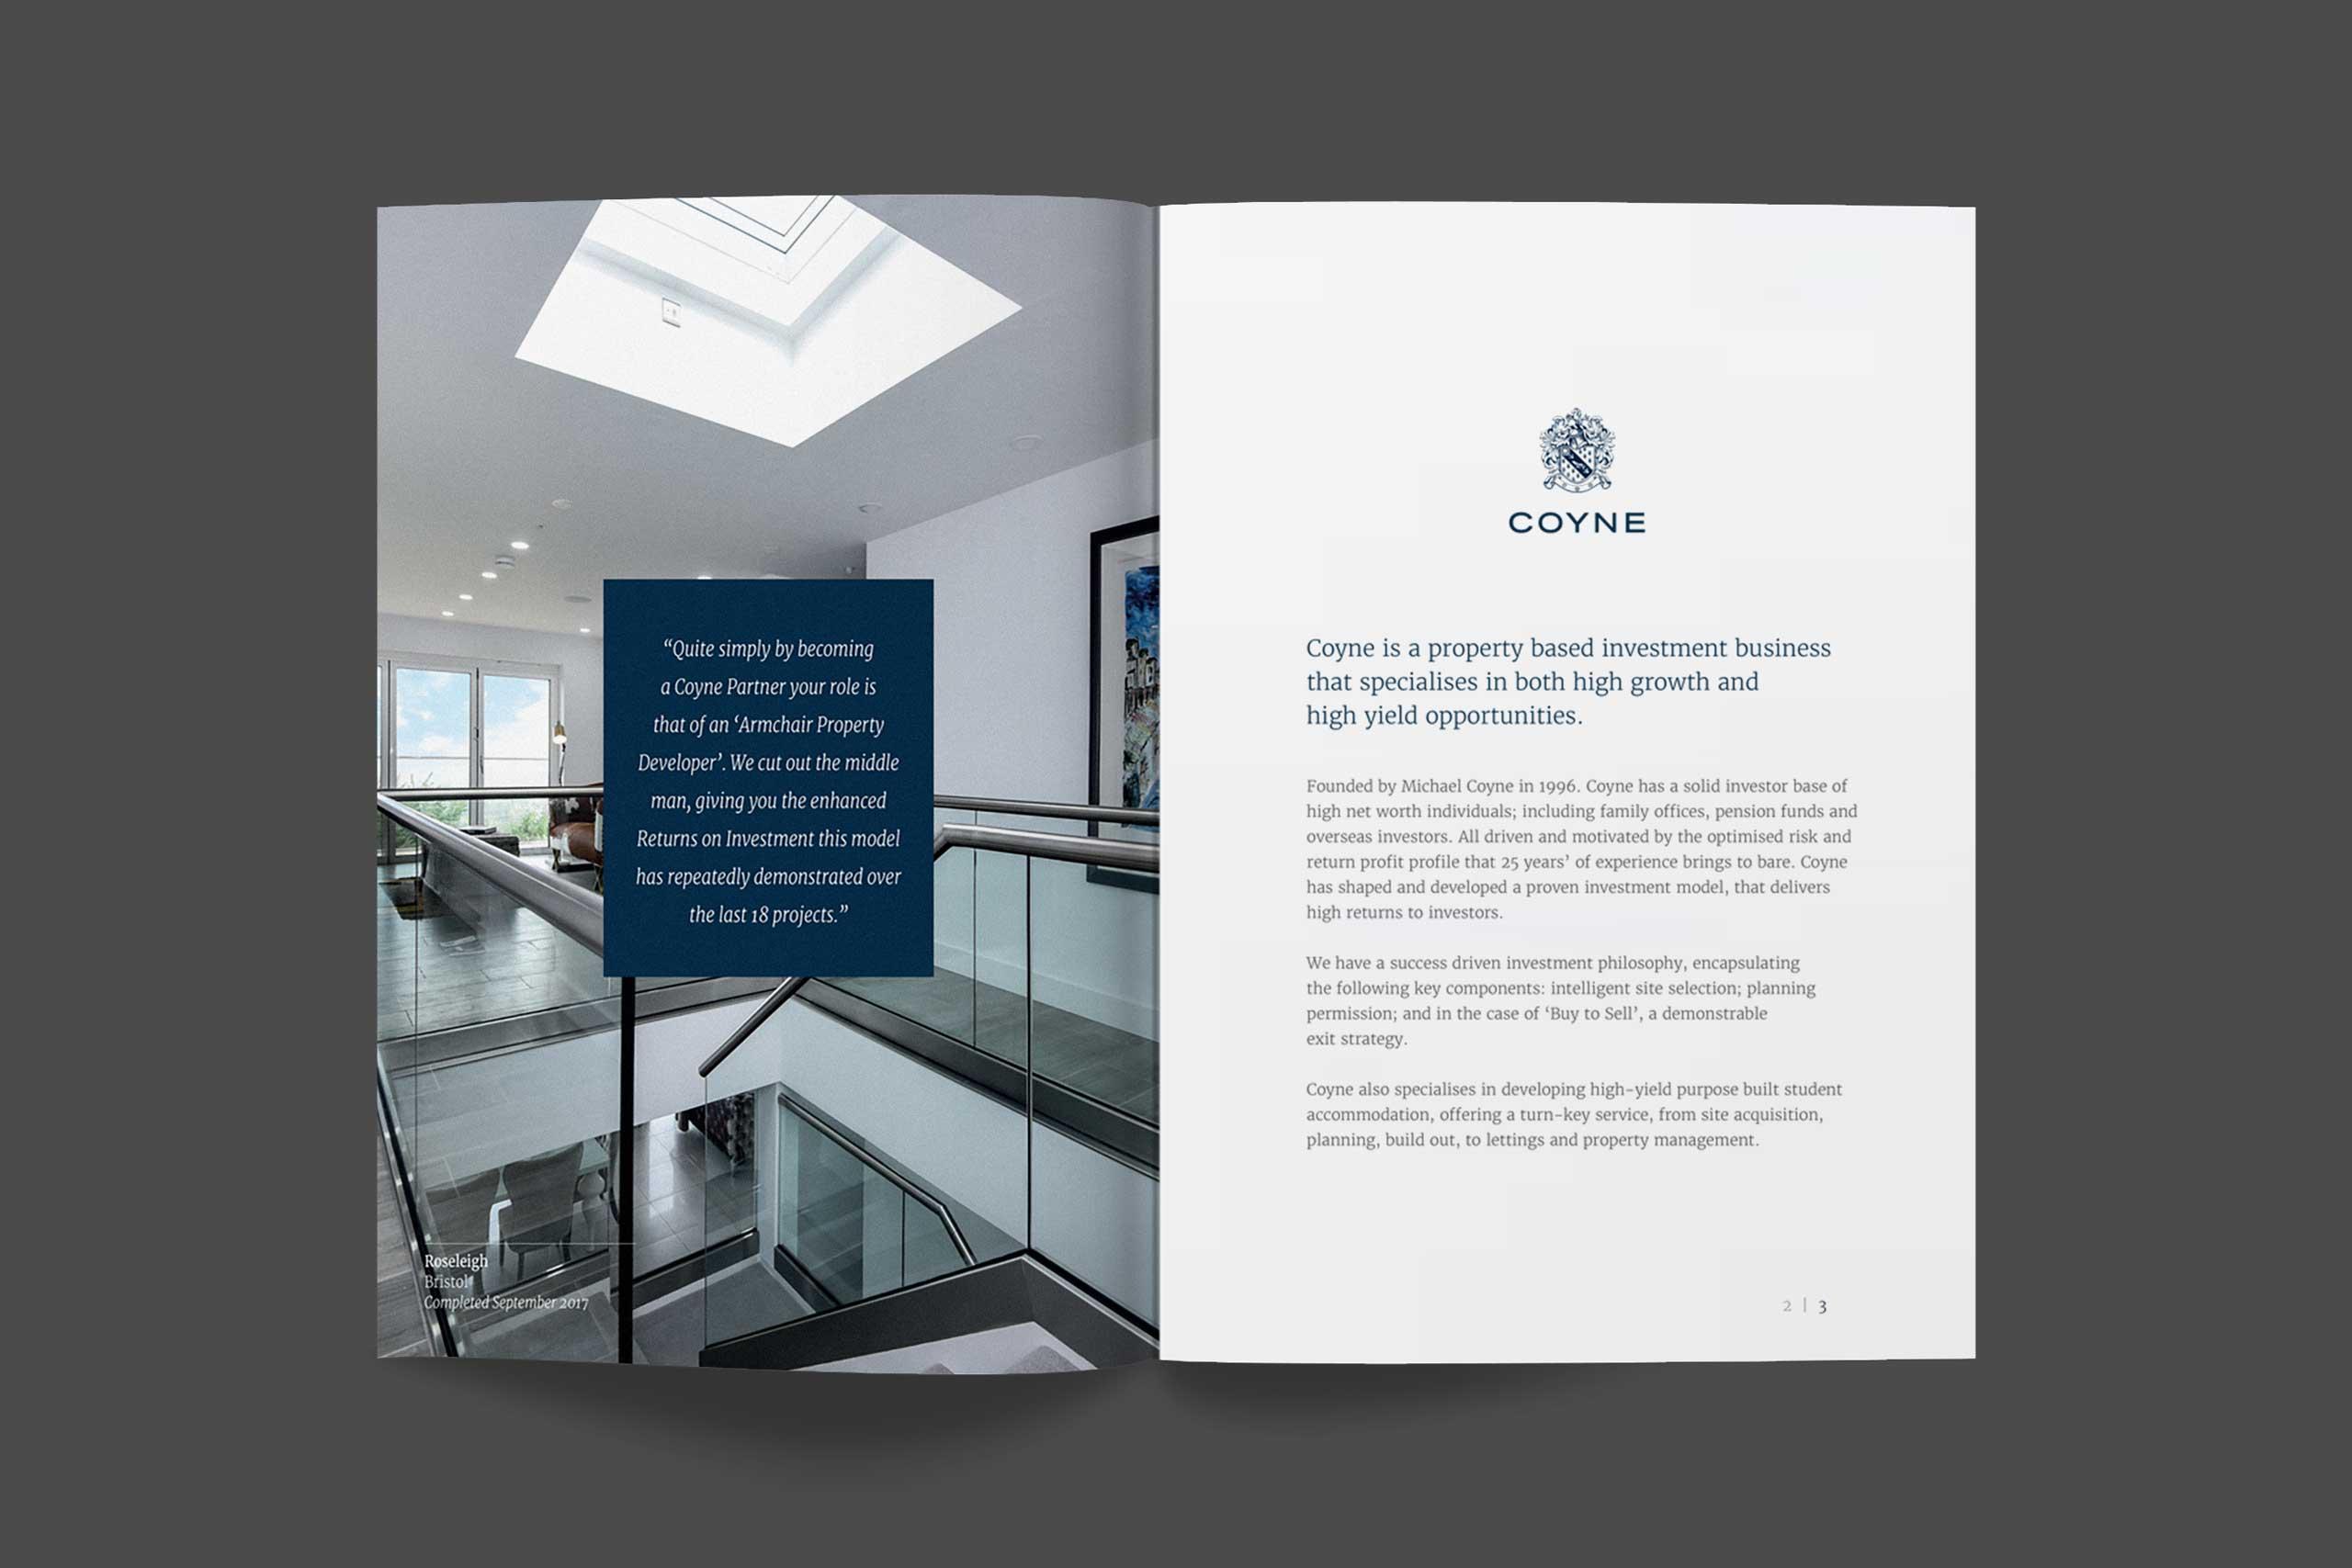 Coyne brochure spread 1 | Property brand marketing